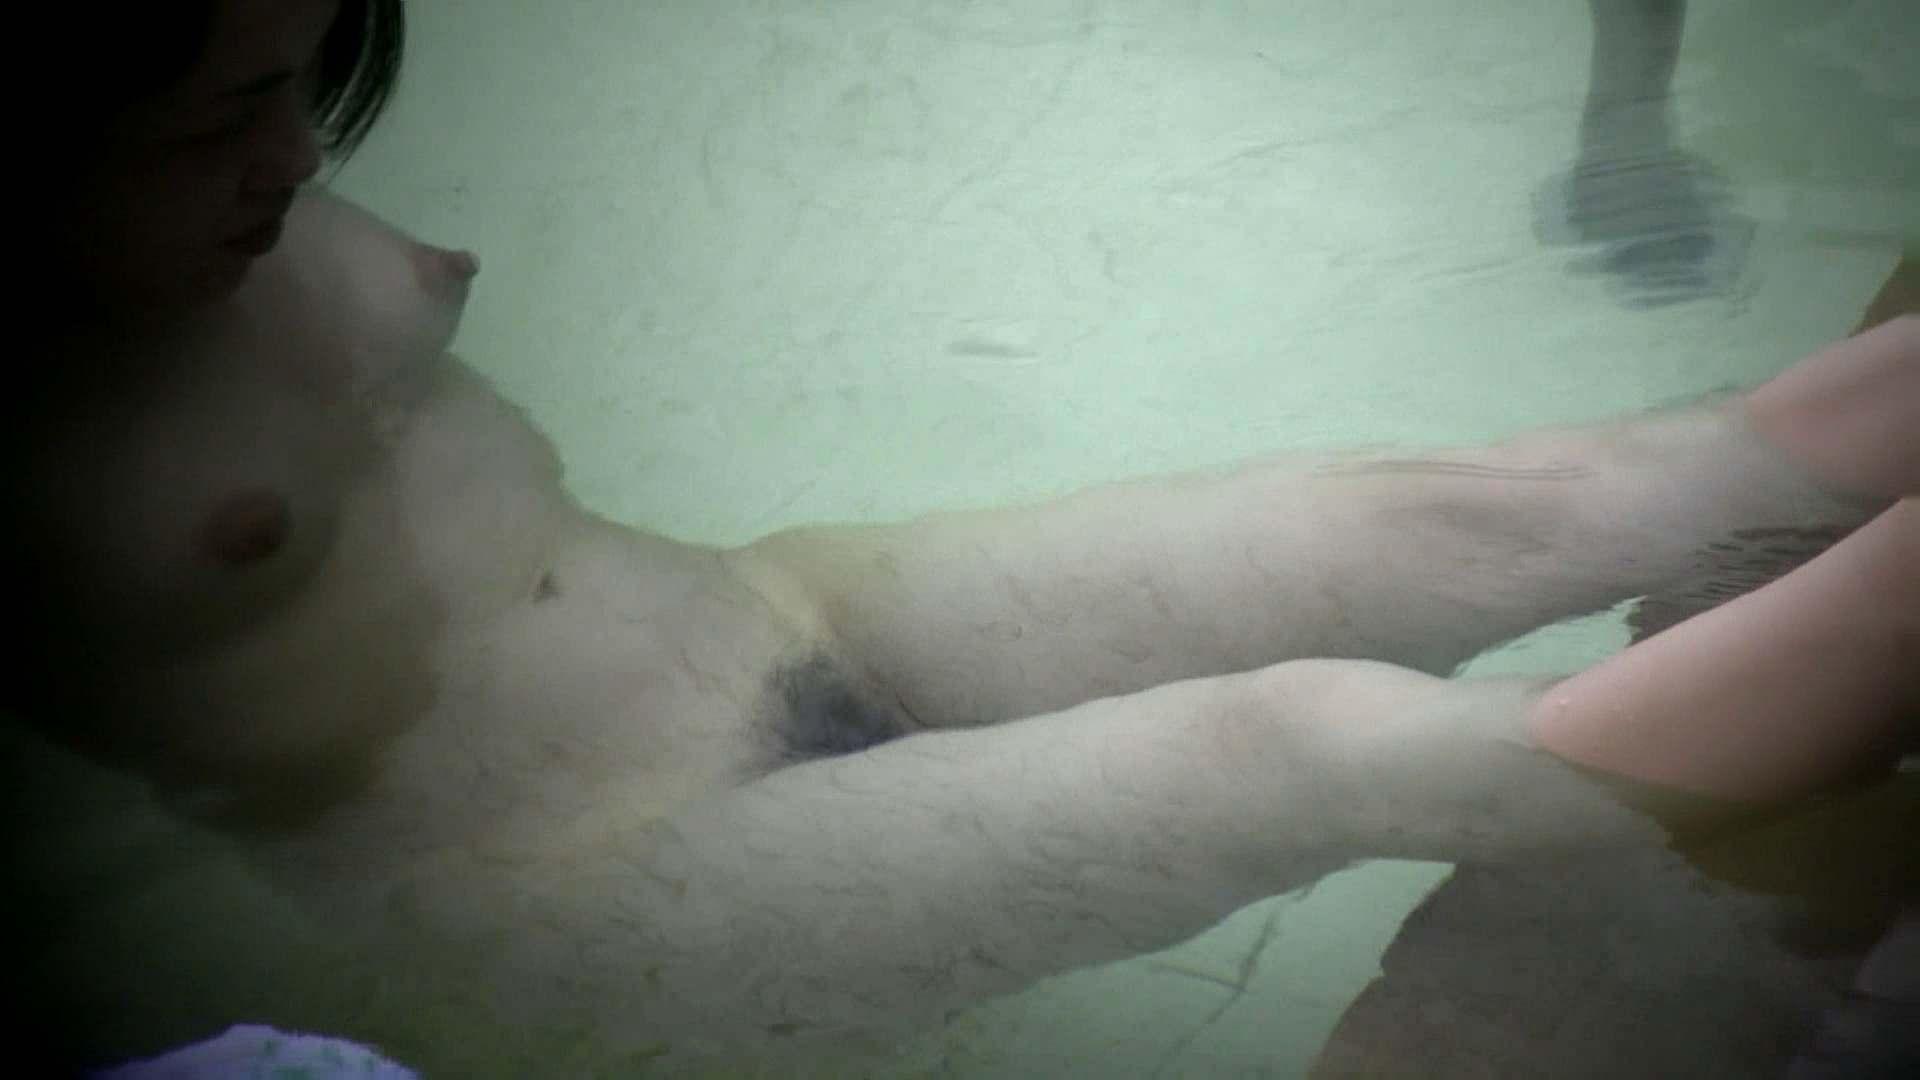 Aquaな露天風呂Vol.651 盗撮師作品 エロ無料画像 74pic 11